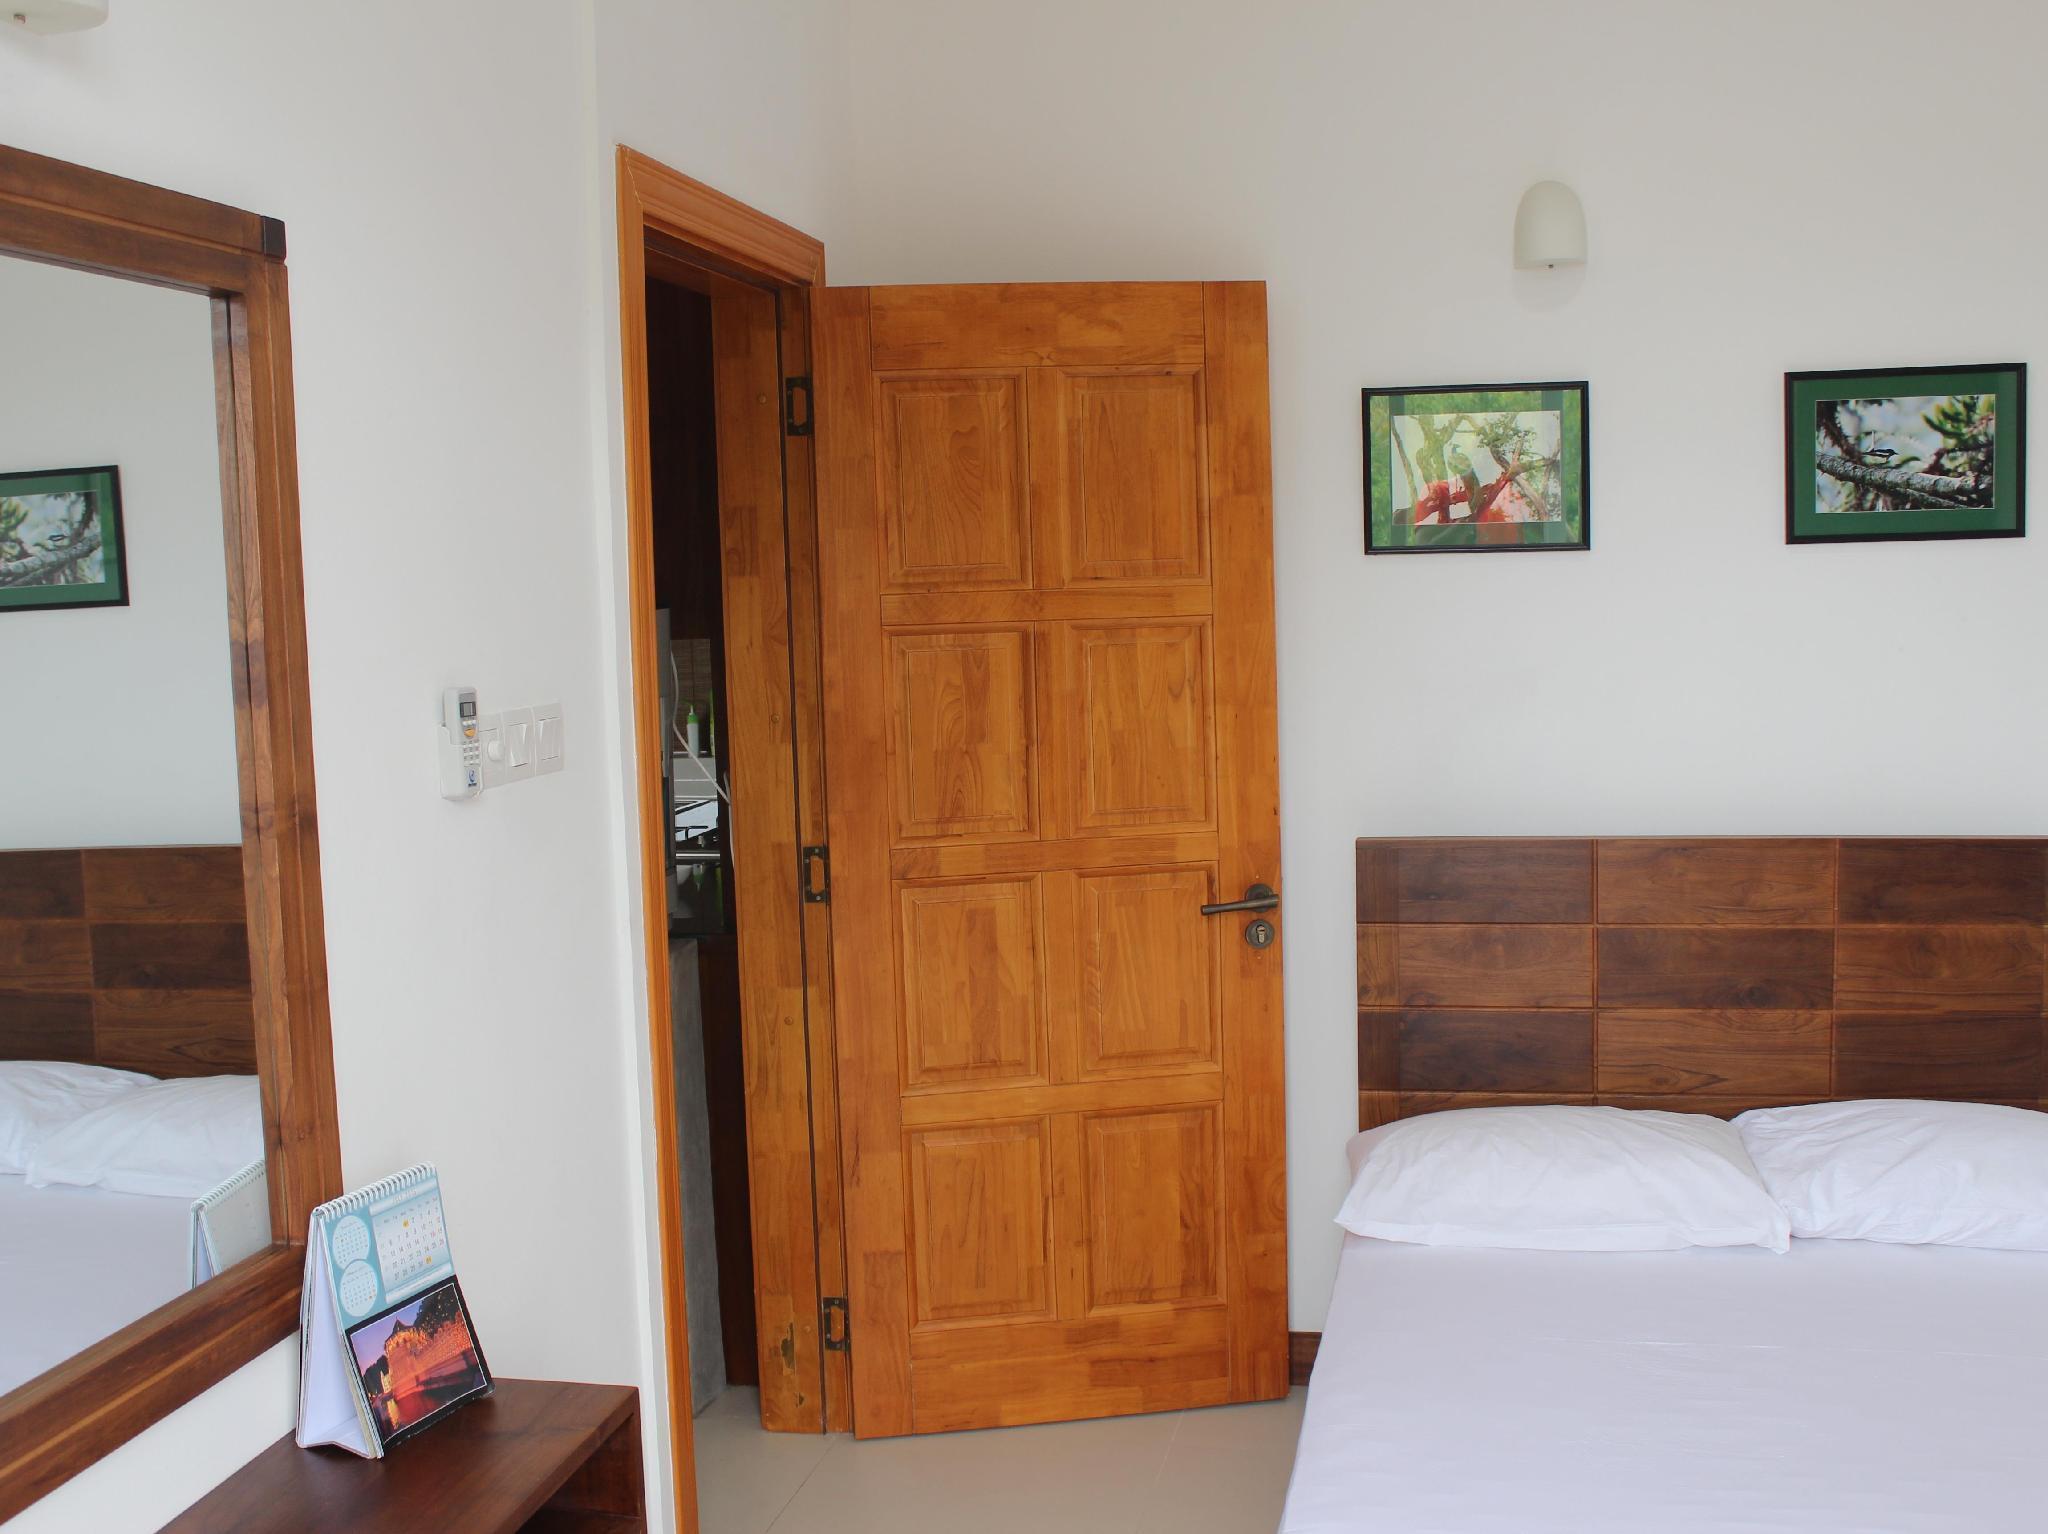 Anaqkara  Luxury Beach Apartment, Dehiwala-Mount Lavinia